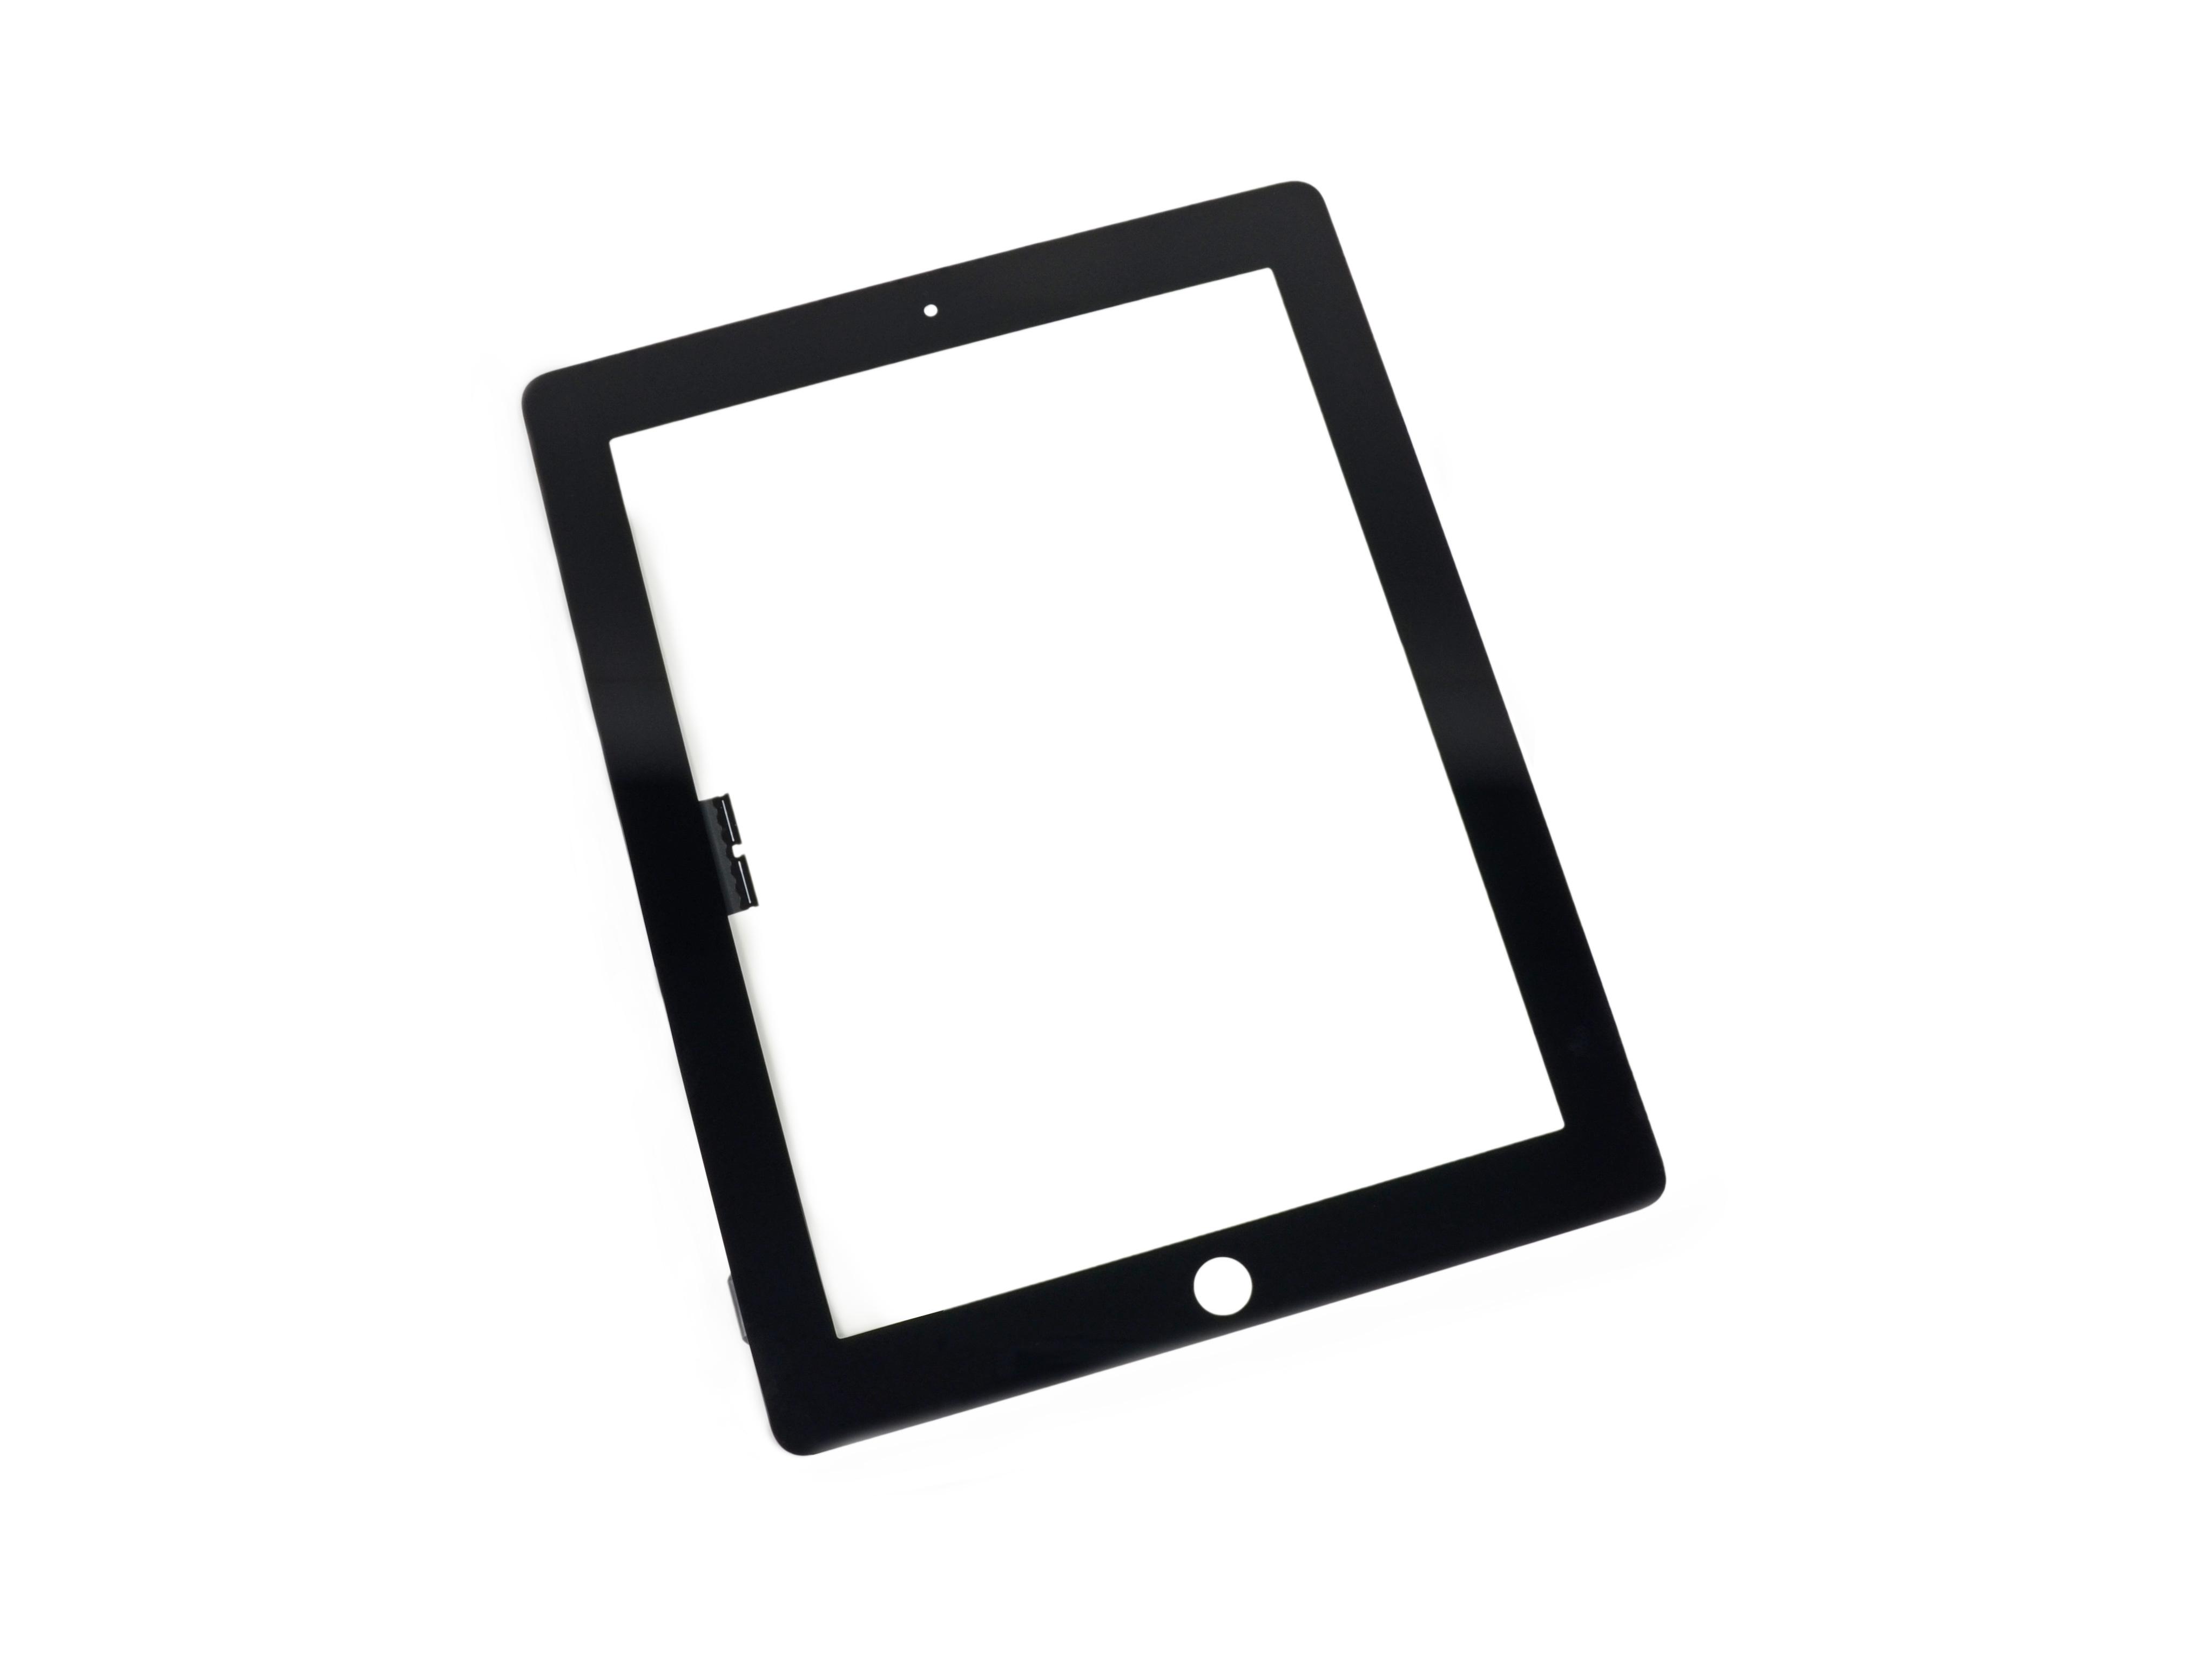 Ipad 3 Wi Fi Repair Ifixit Logic Board Diagram Front Panel